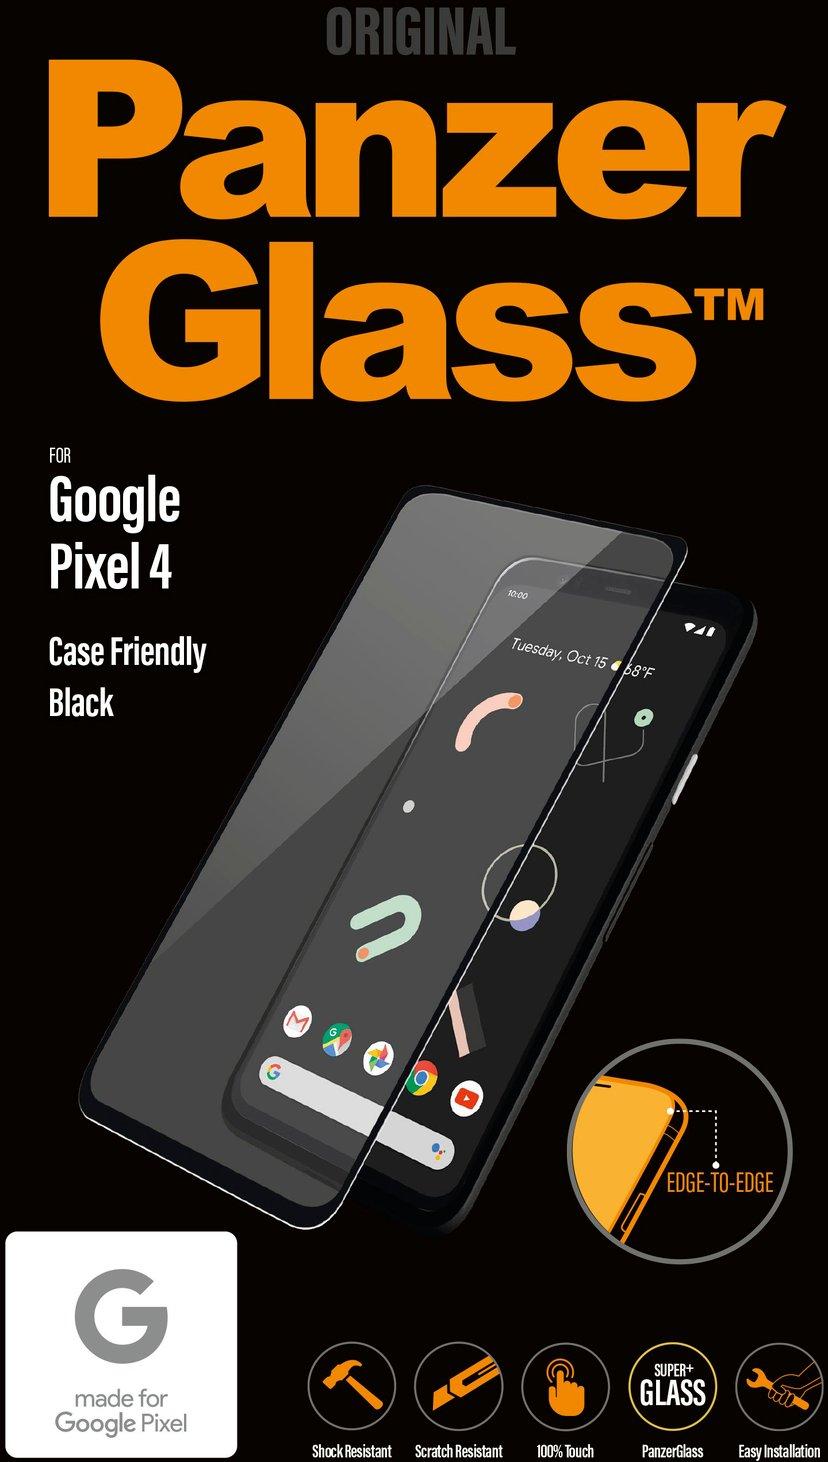 Panzerglass Case Friendly Google Pixel 4